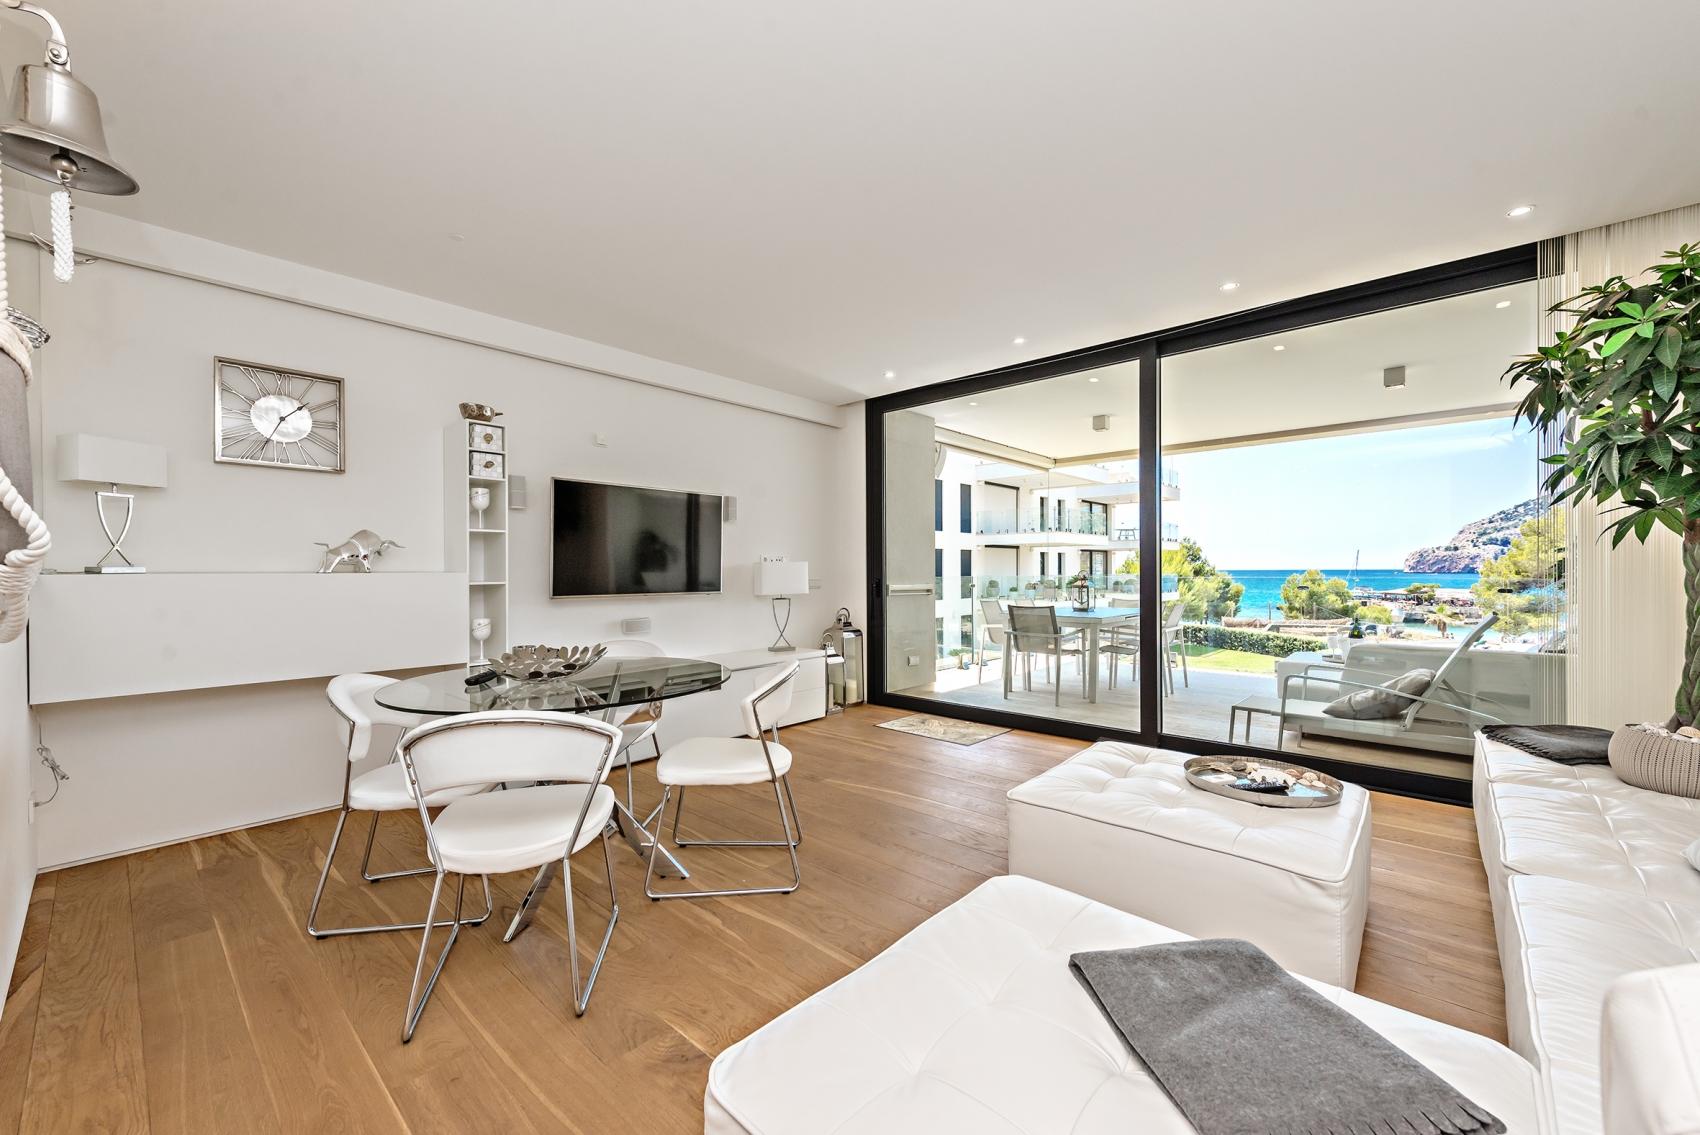 Wohnung Mallorca mit Meerblick in Camp de Mar